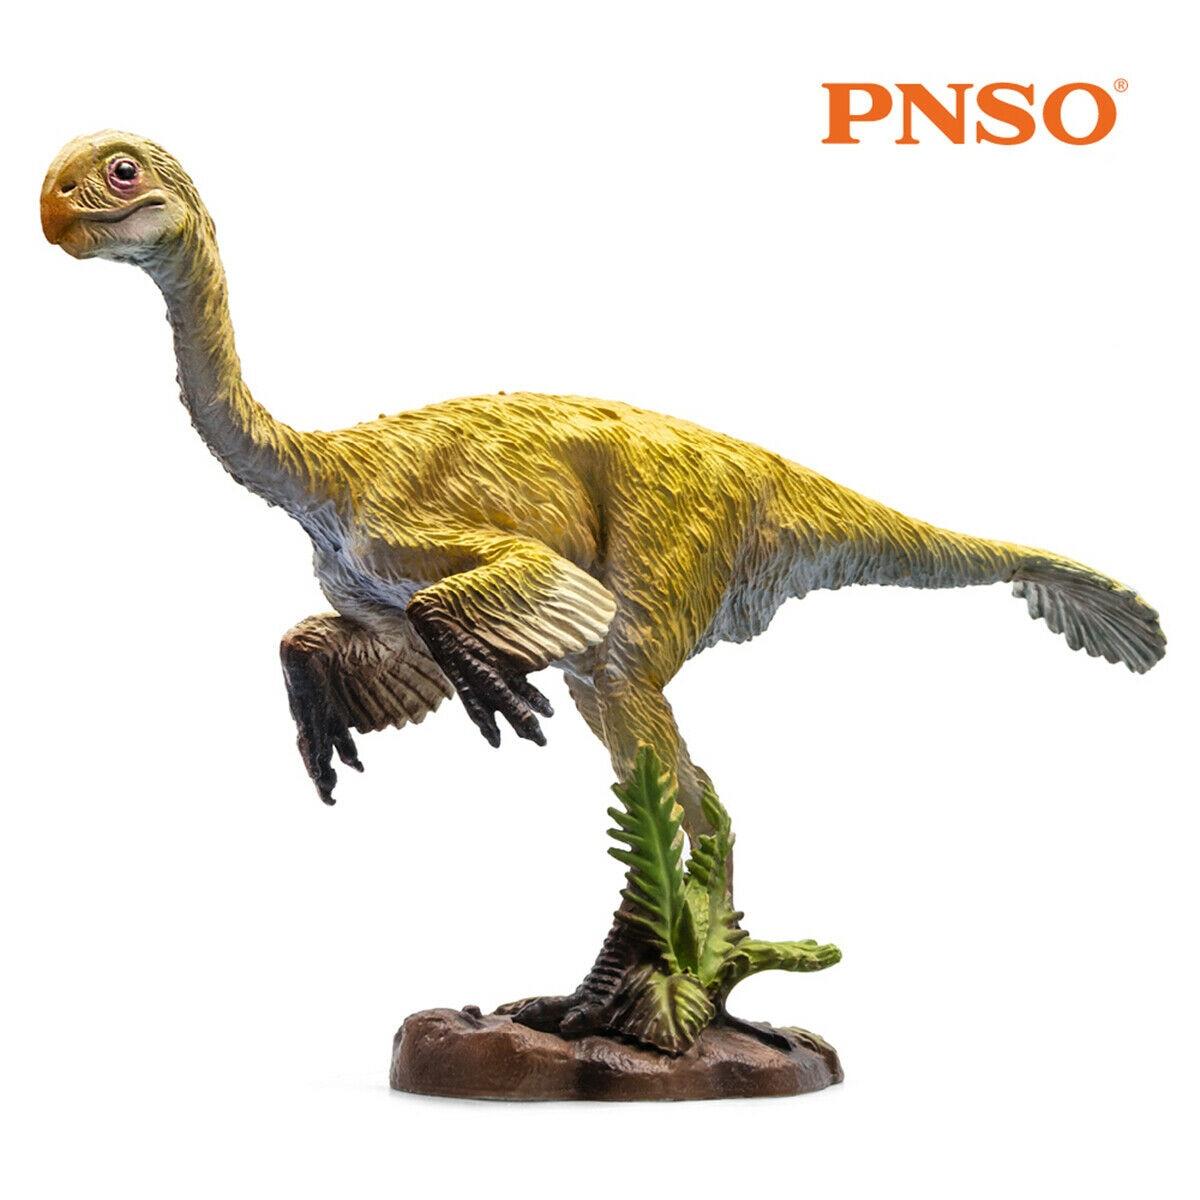 Triceratop Dinosaur Model Scientific Animal Realistic Art Figure Decor